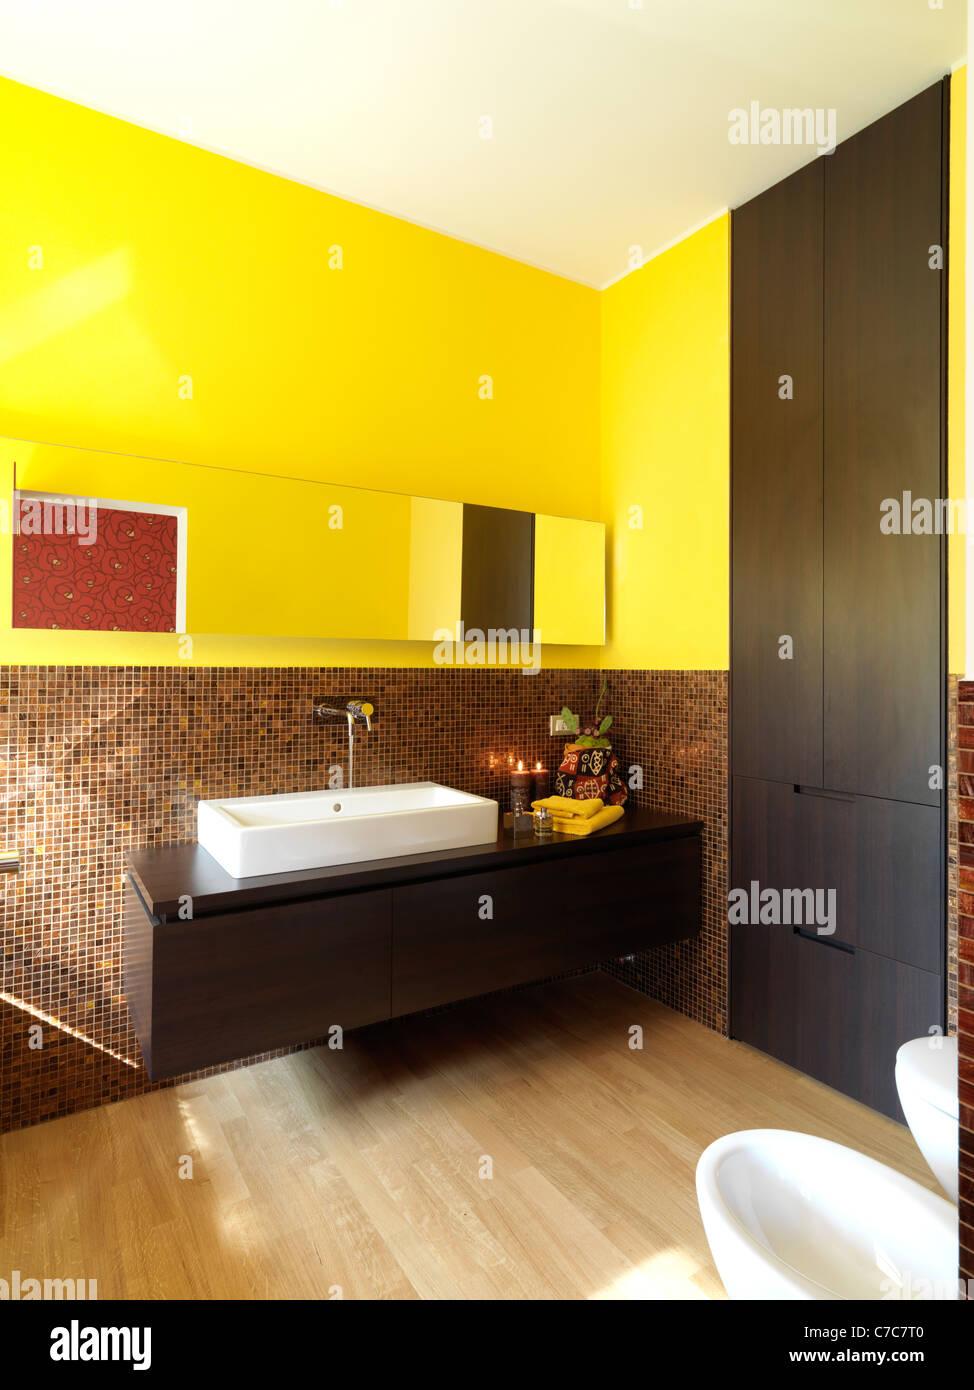 Color Interiors Vertical Bathroom Stock Photos & Color Interiors ...